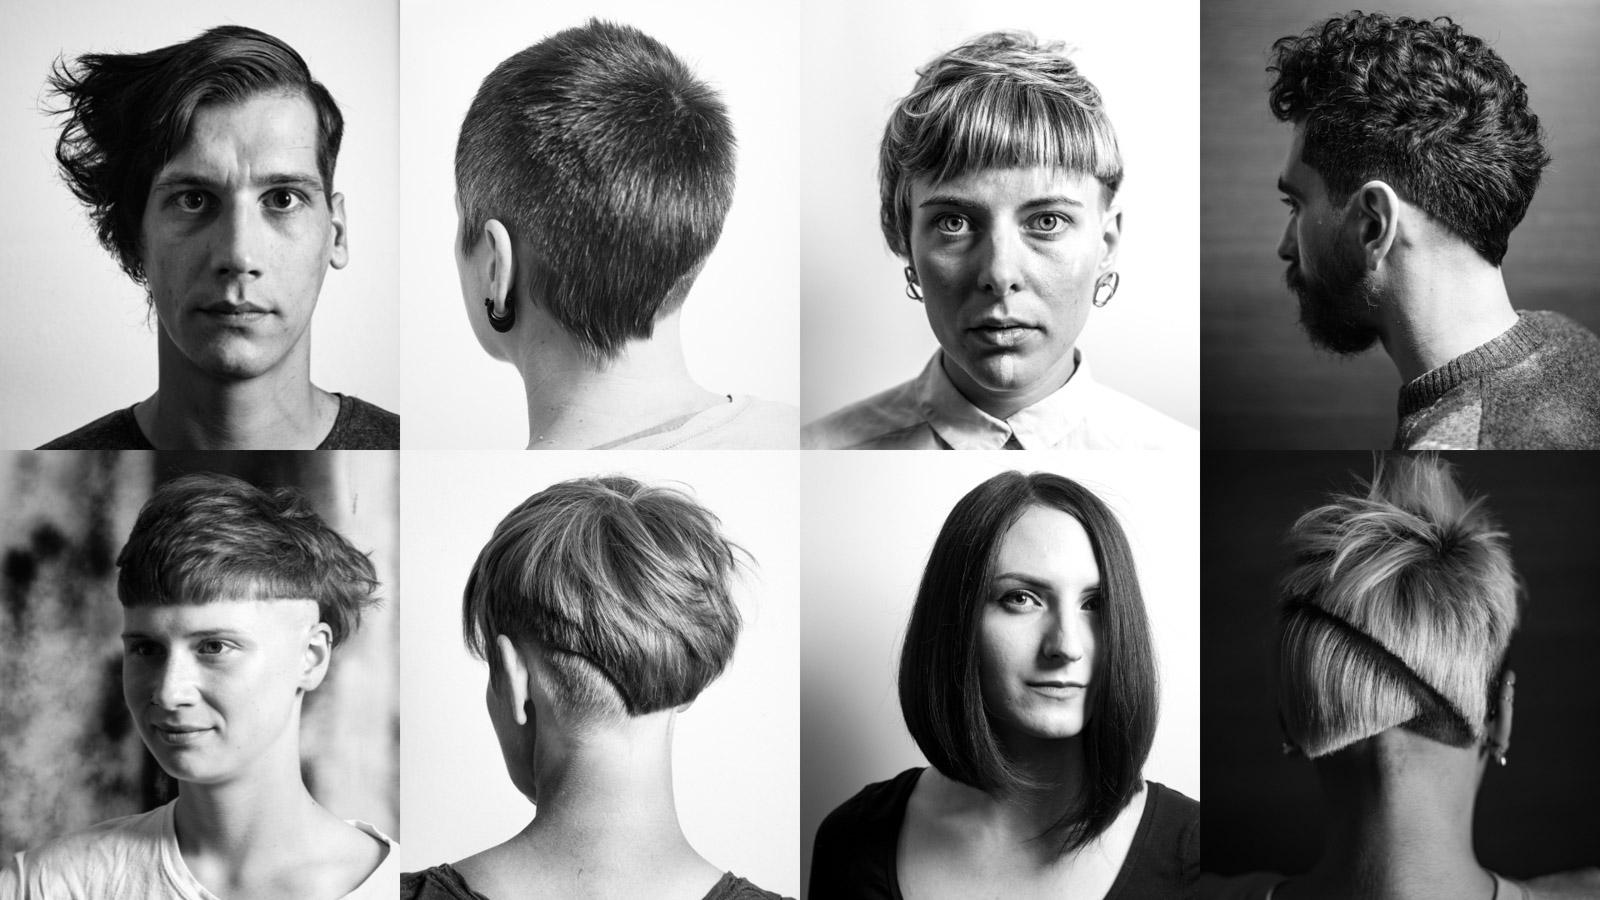 Izbor frizura Matthewa Jastrzemskog